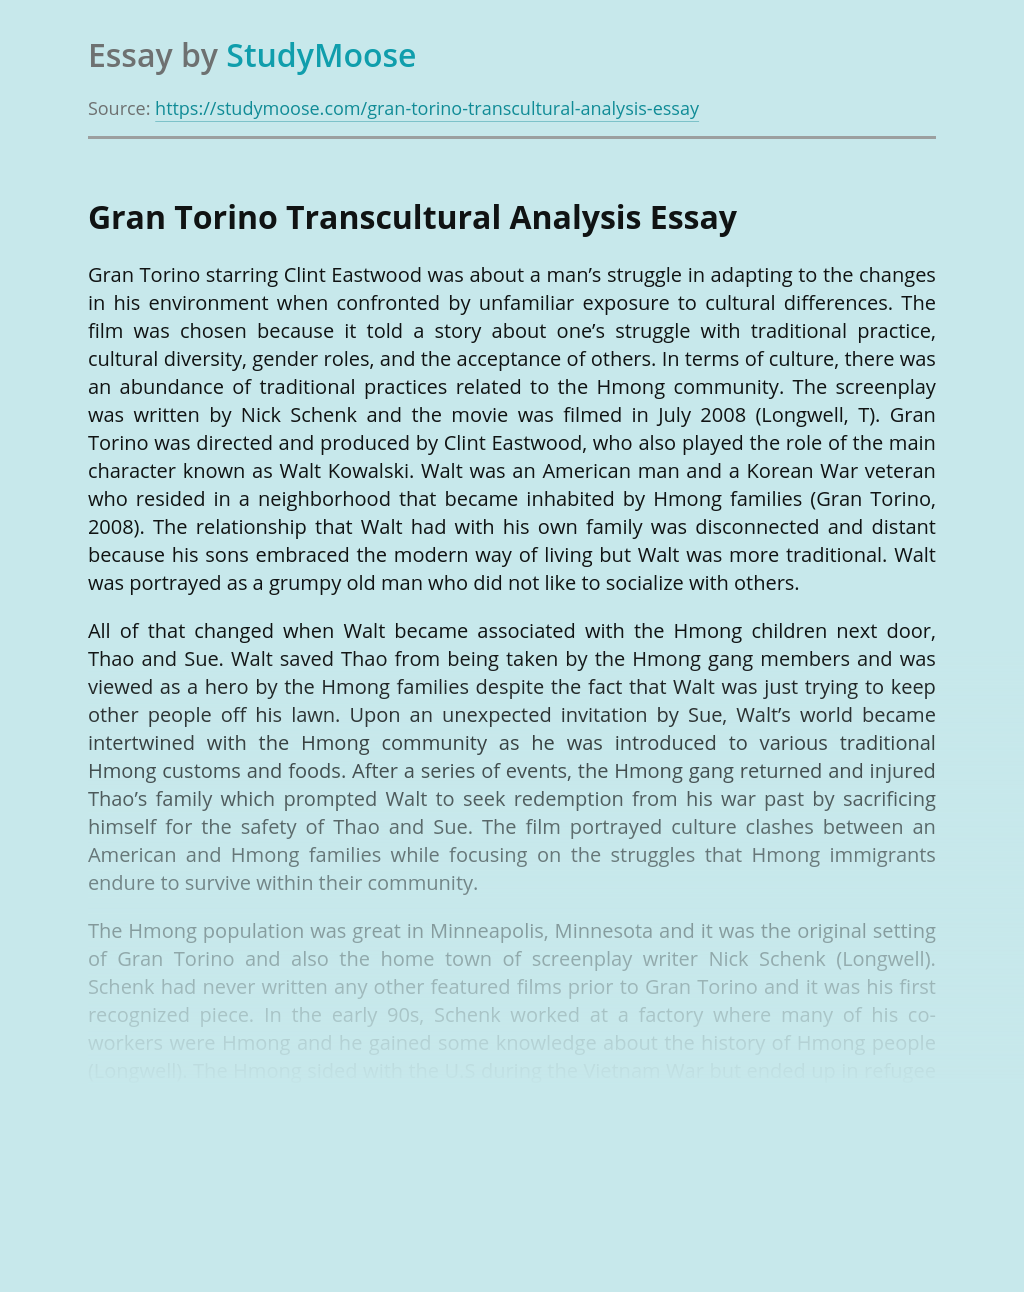 Transcultural Analysis of Relationship in Gran Torino